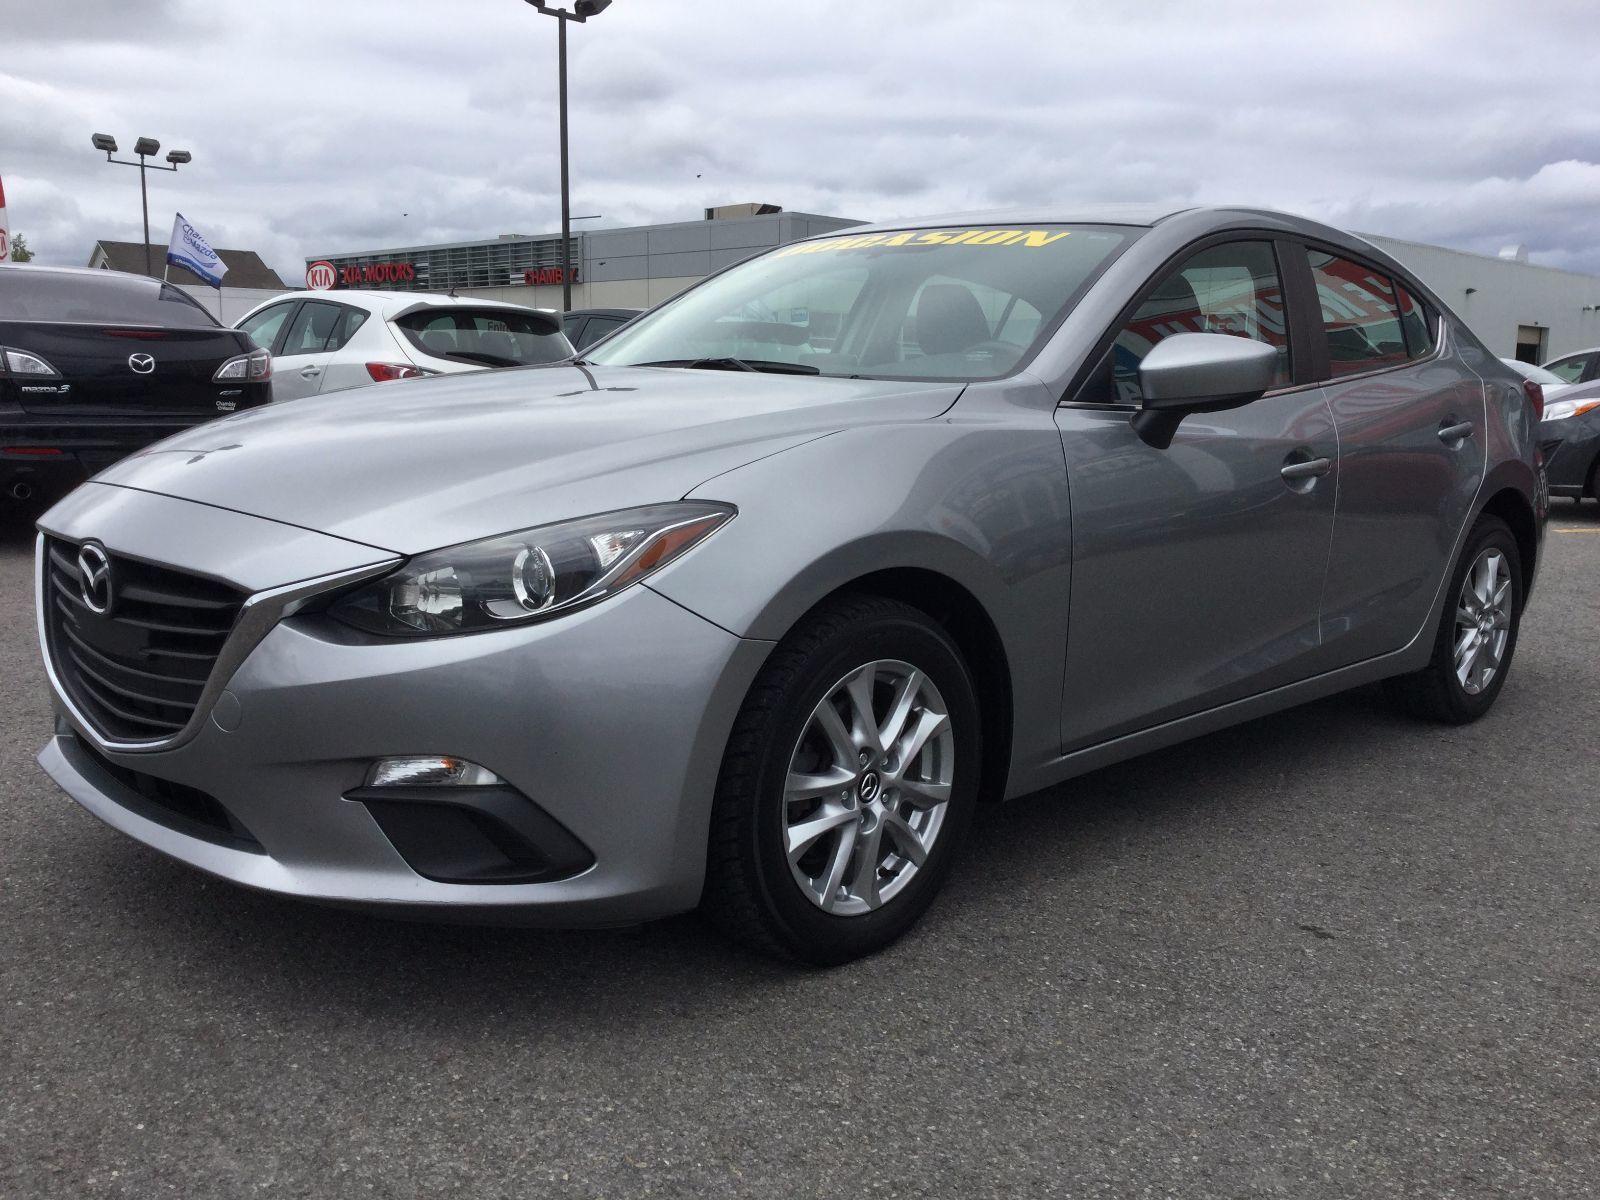 Mazda Mazda3 **RÉSERVÉ**, GS-SKY, GARANTIE JUSQU EN 2019 2014 jAMAIS ACCIDENTÉ, UN SEUL PROPRIÉTAIRE, BAS KILLOMÉTRAGE